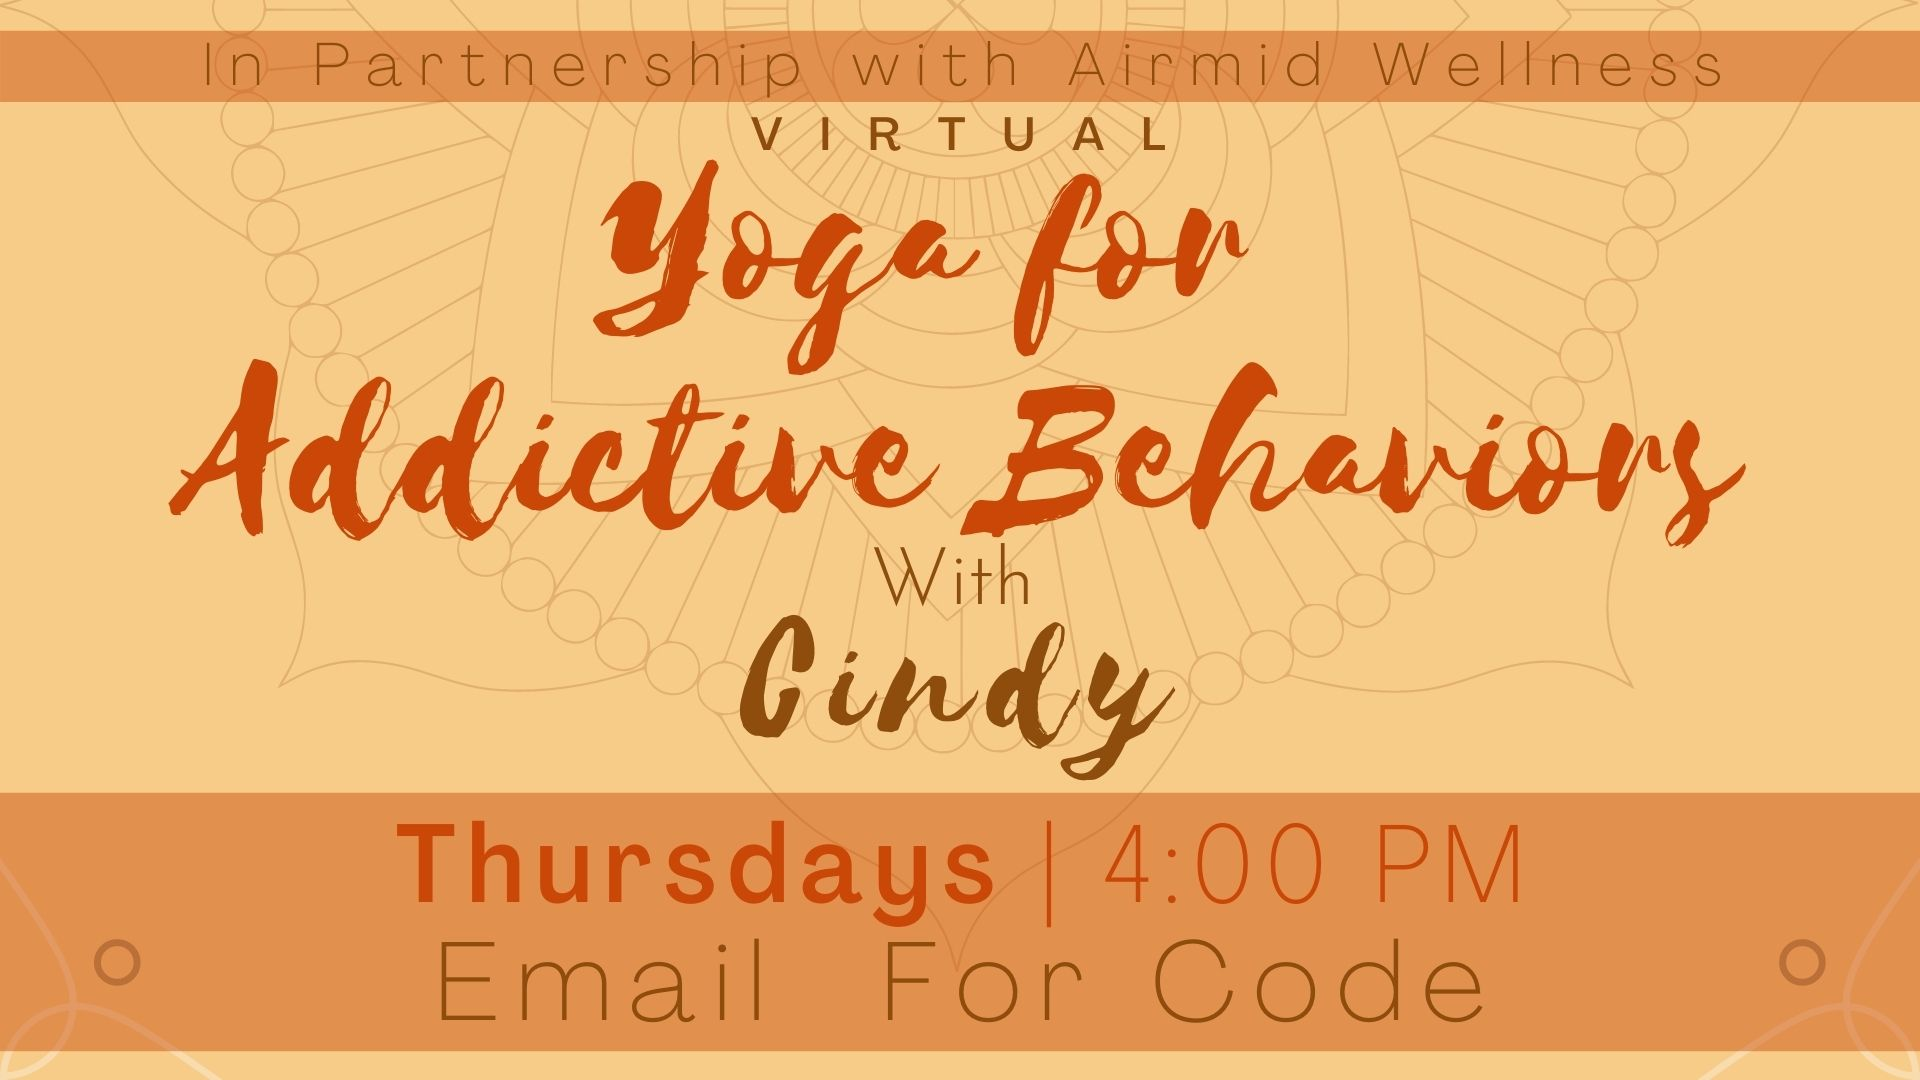 Yoga for Addictive Behaviors with Cindy